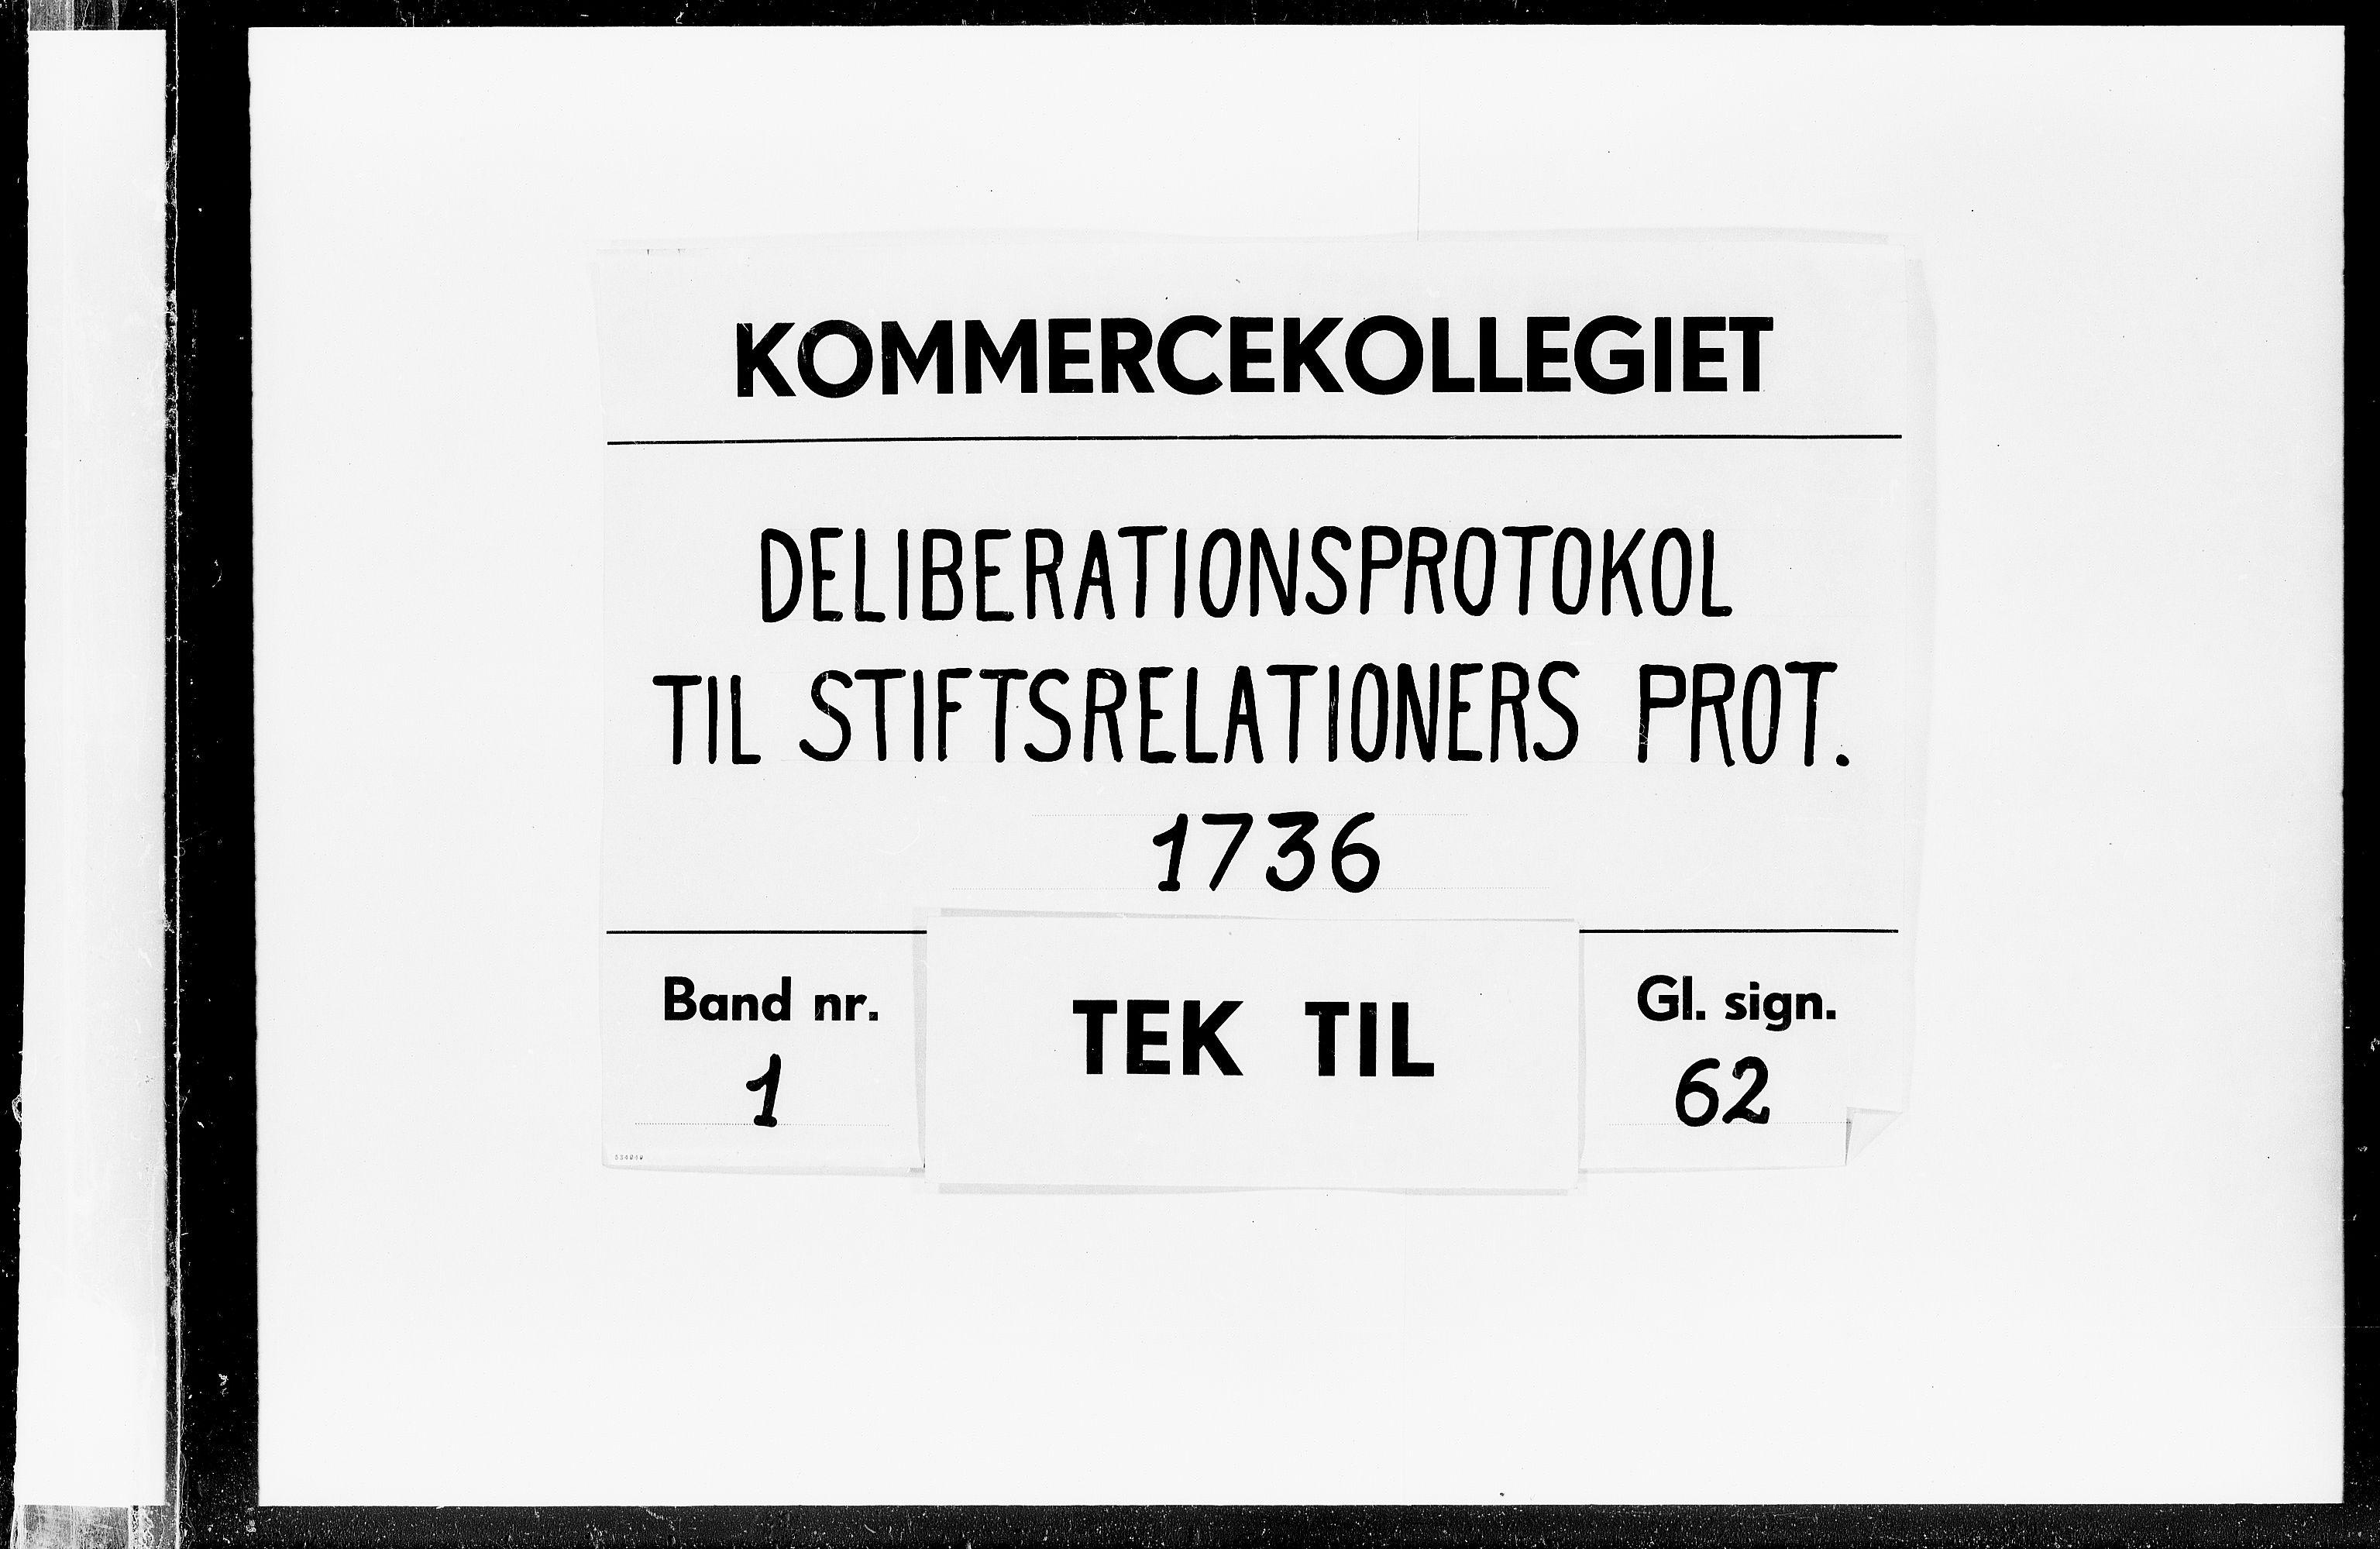 DRA, Kommercekollegiet, Dansk-Norske Sekretariat, -/27: Deliberationsprotokol til Stiftrelationers Protokol, 1736